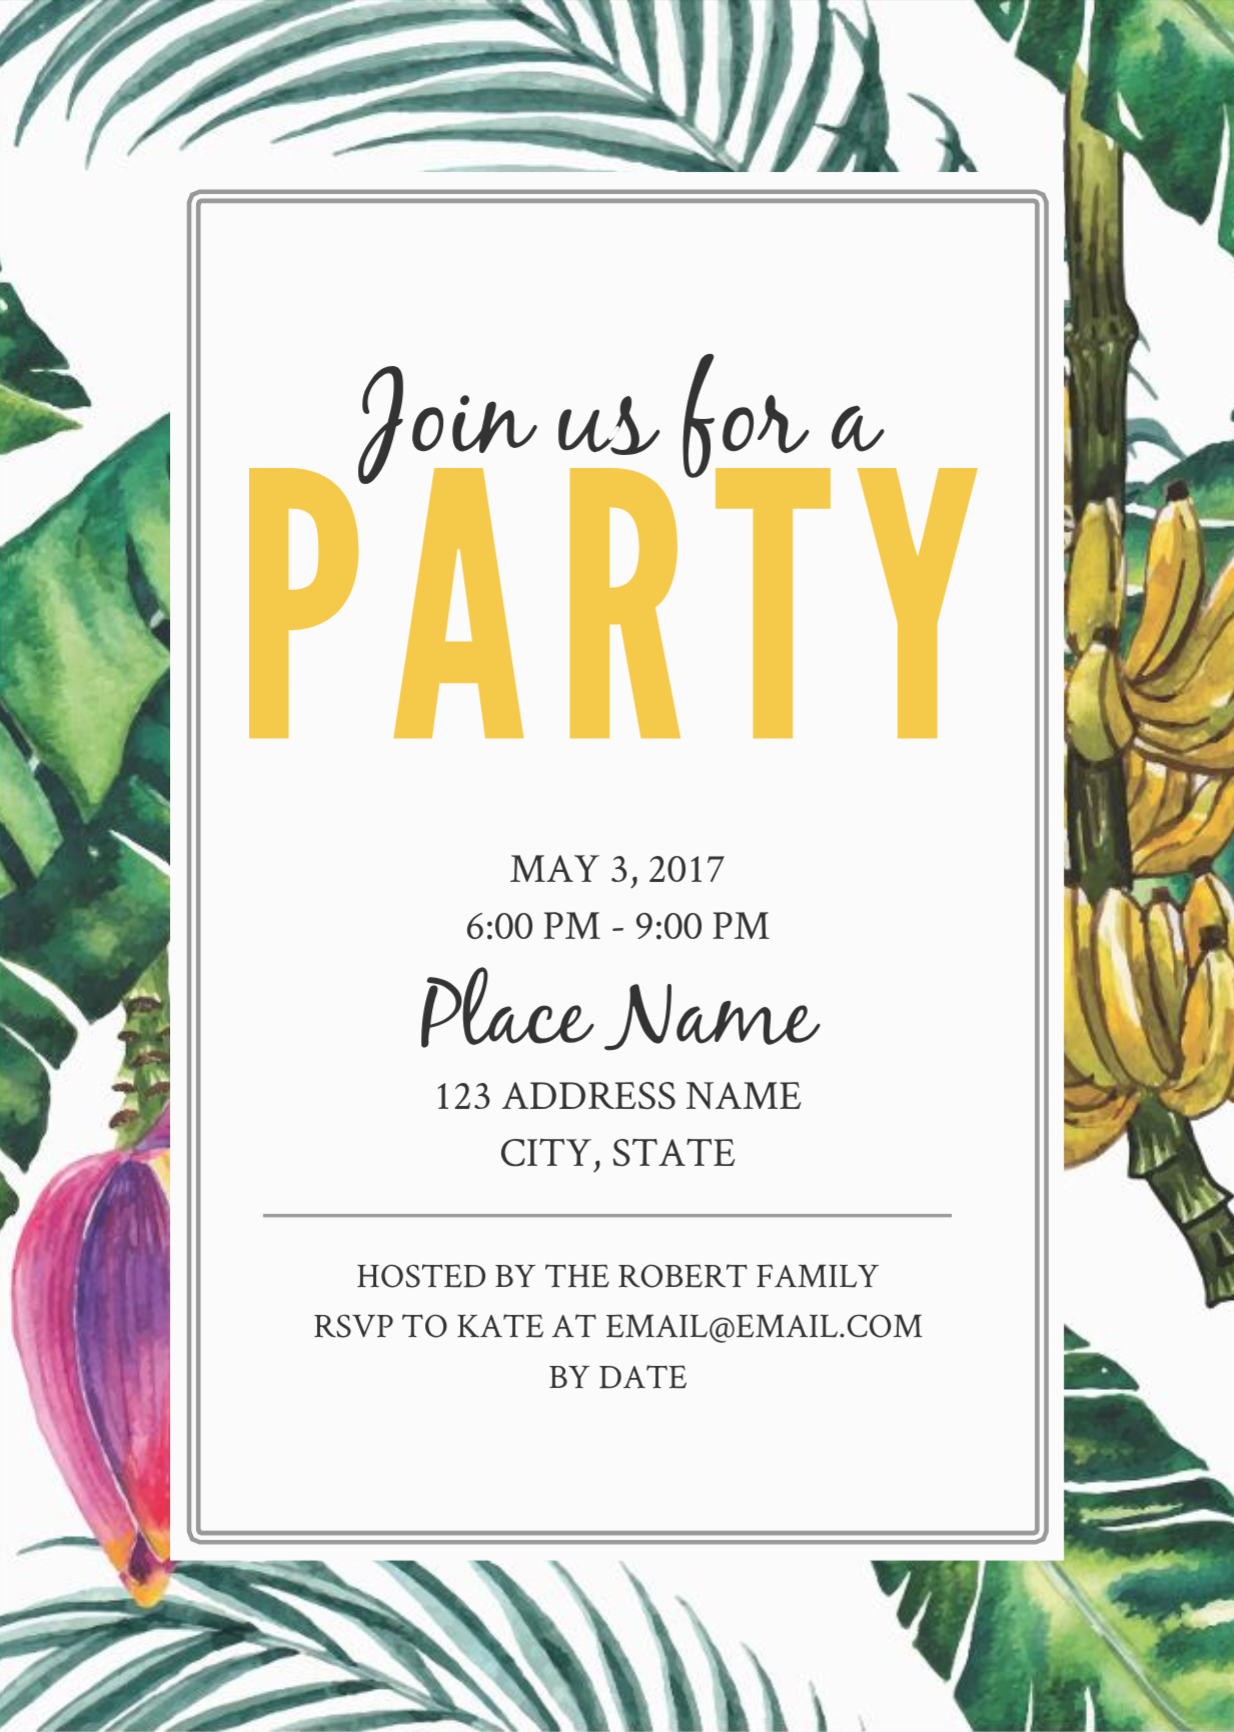 Birthday Invitations Sample Letter Ideas 2019 Free Party Invitations Free Party Invitation Templates Free Invitation Cards